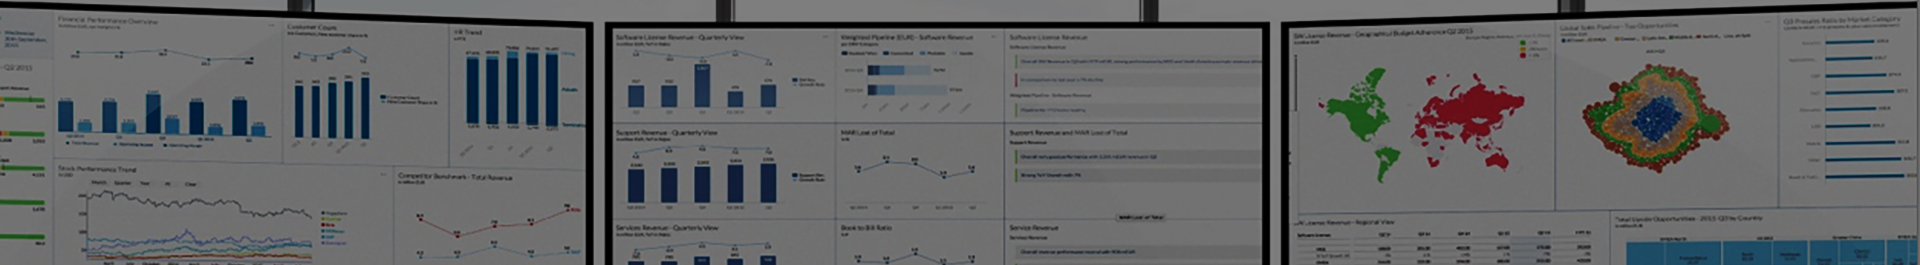 Business-Objects-Cloud-Digital-Boardroom.png